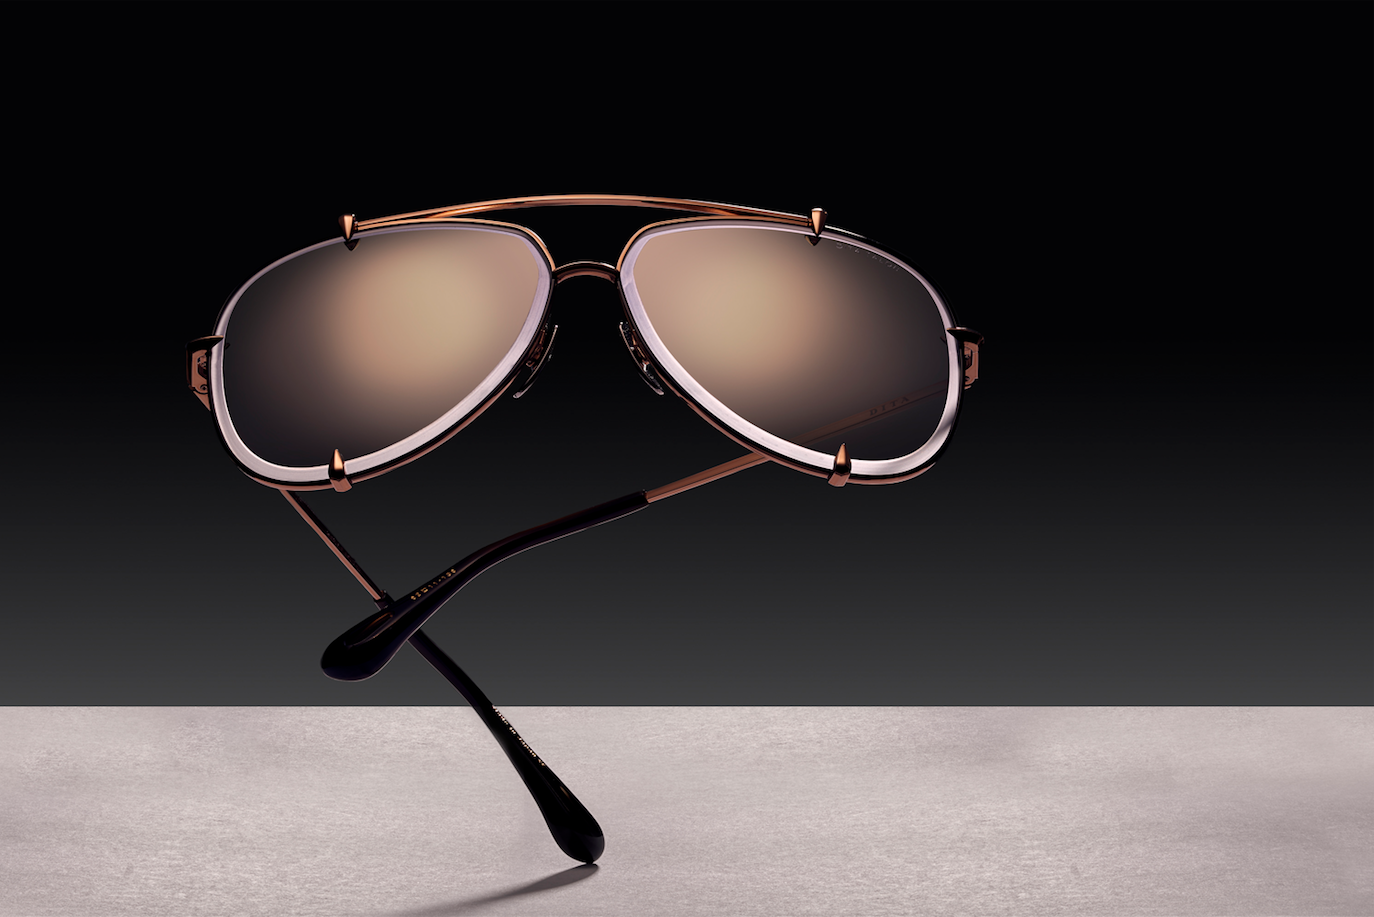 The TALON Aviator Sunglasses in Rose Gold by DITA Eyewear